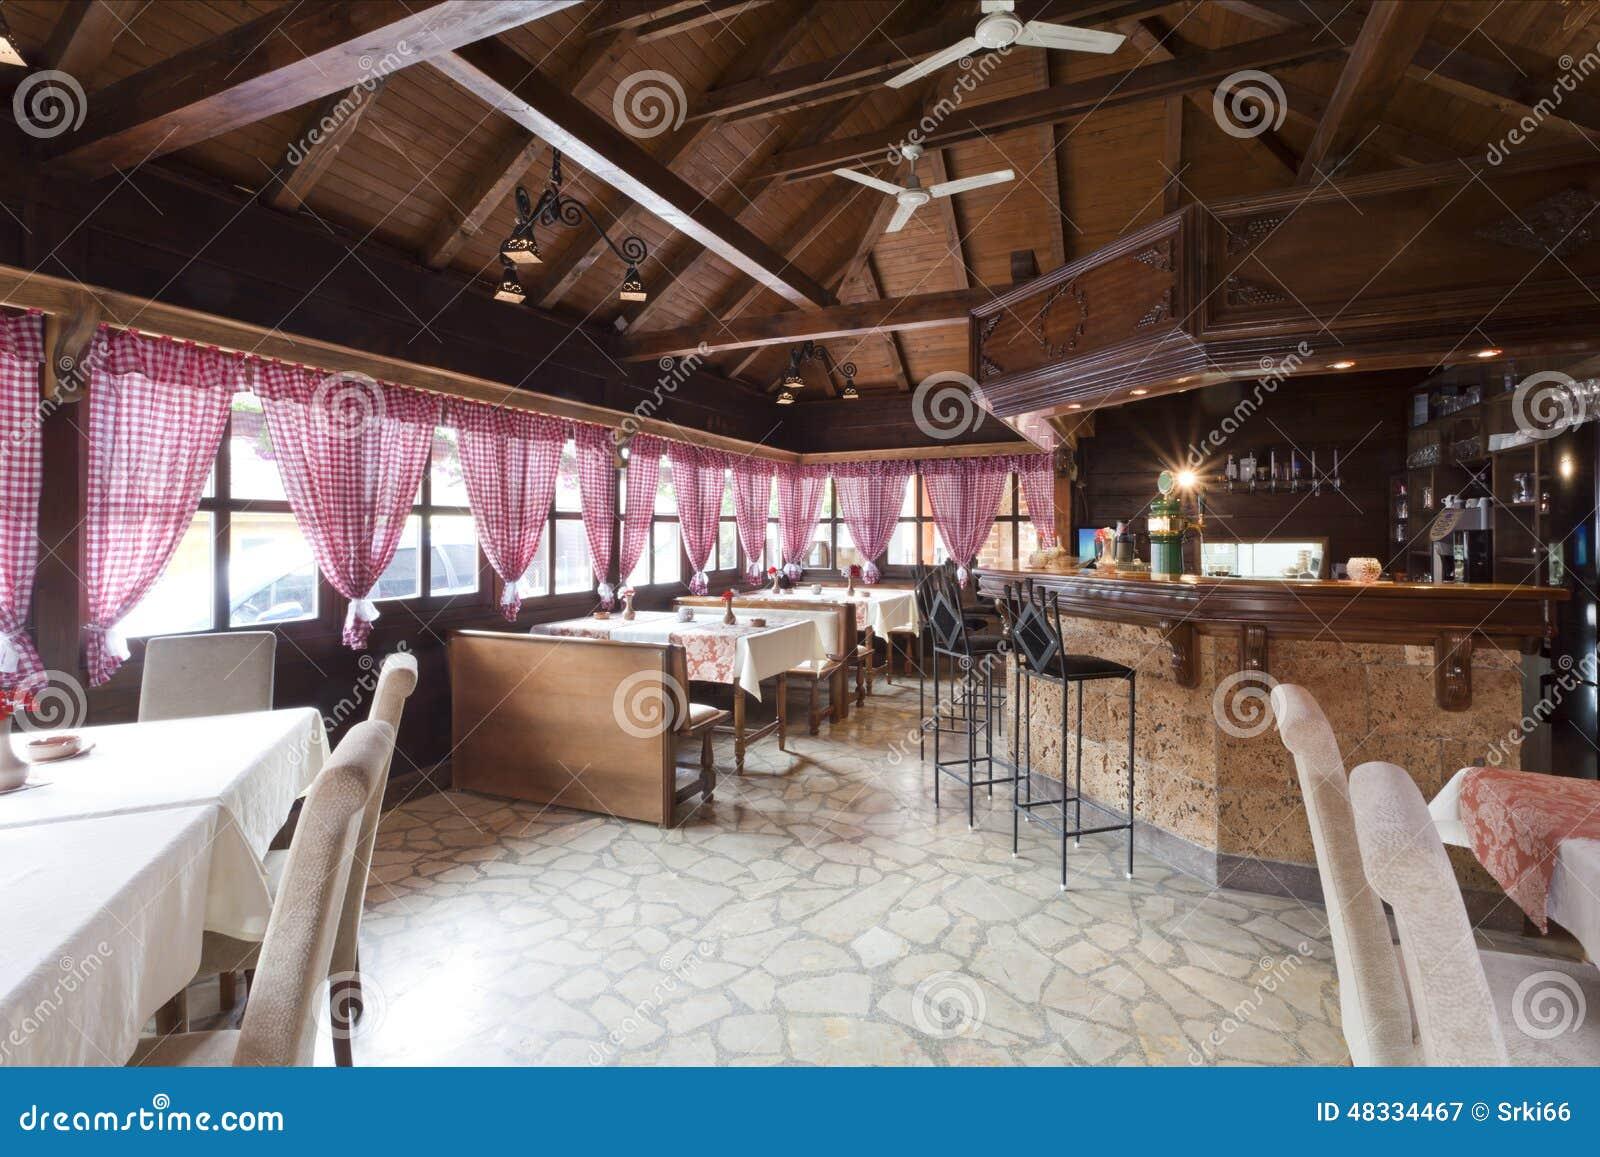 Interior Ethnic Restaurants Stock Image